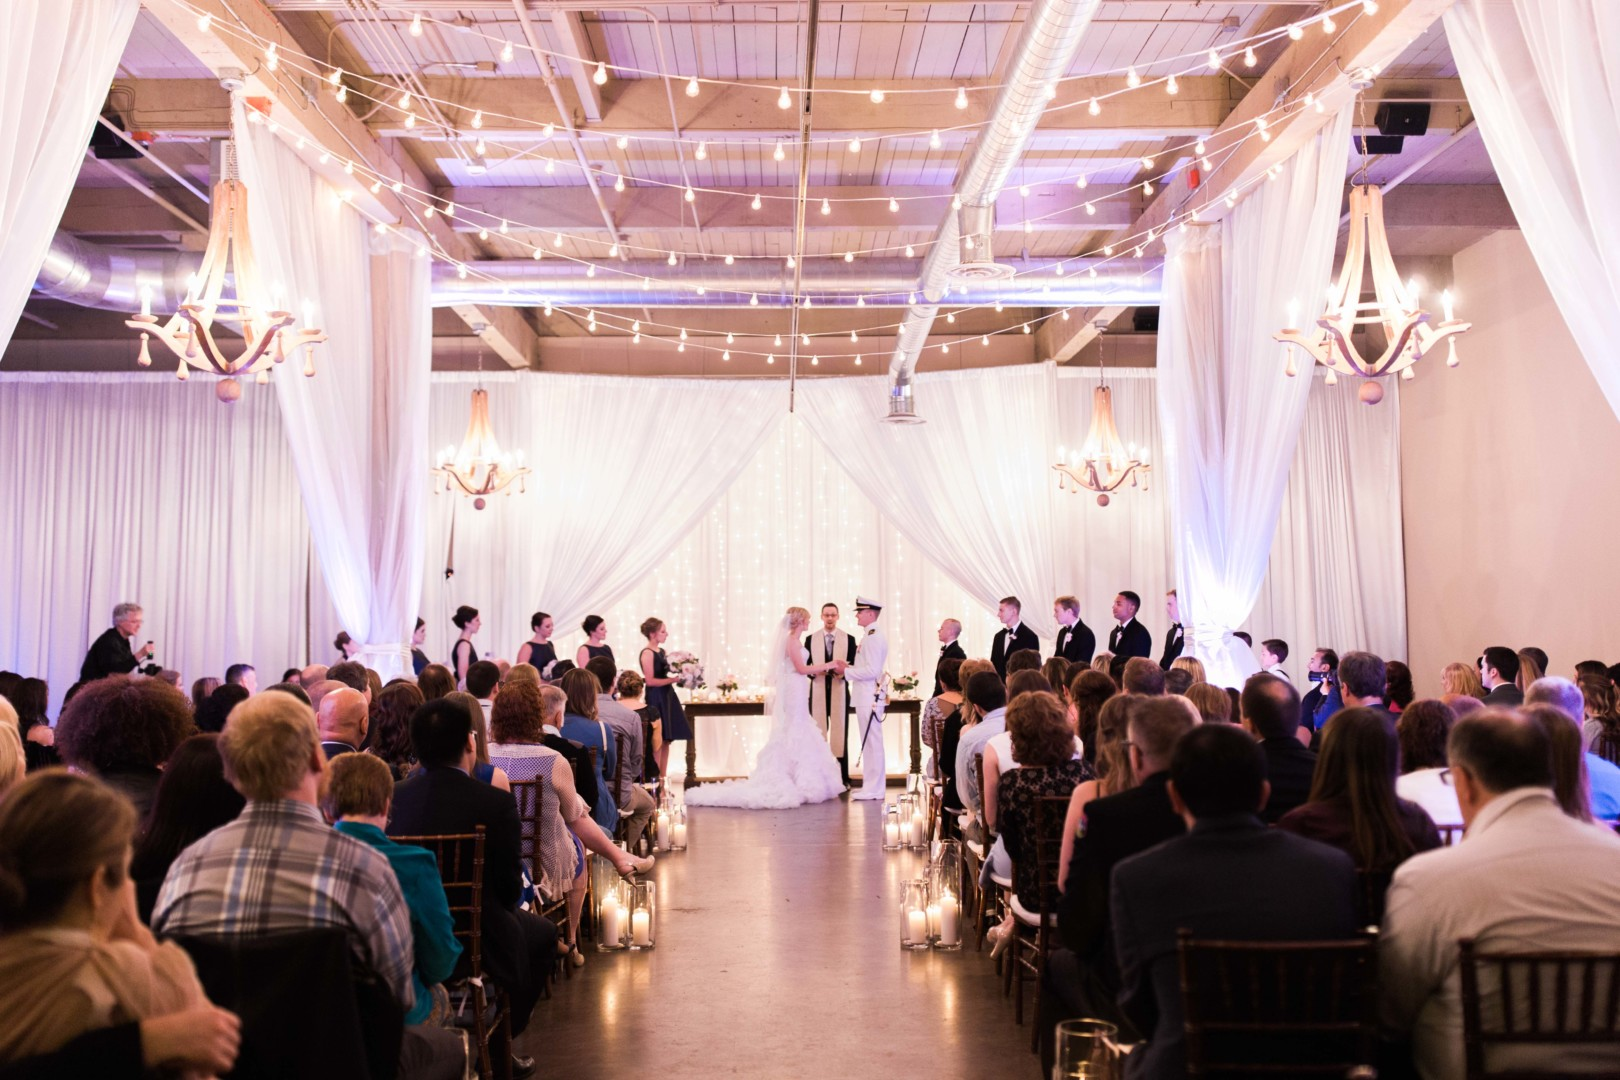 16-5-Looch-Lauren-Worl-Seattle-Wedding-Photography-Nicole-Barkis-Photographer-The-Foundry-Herban-Feast-Ceremony-83